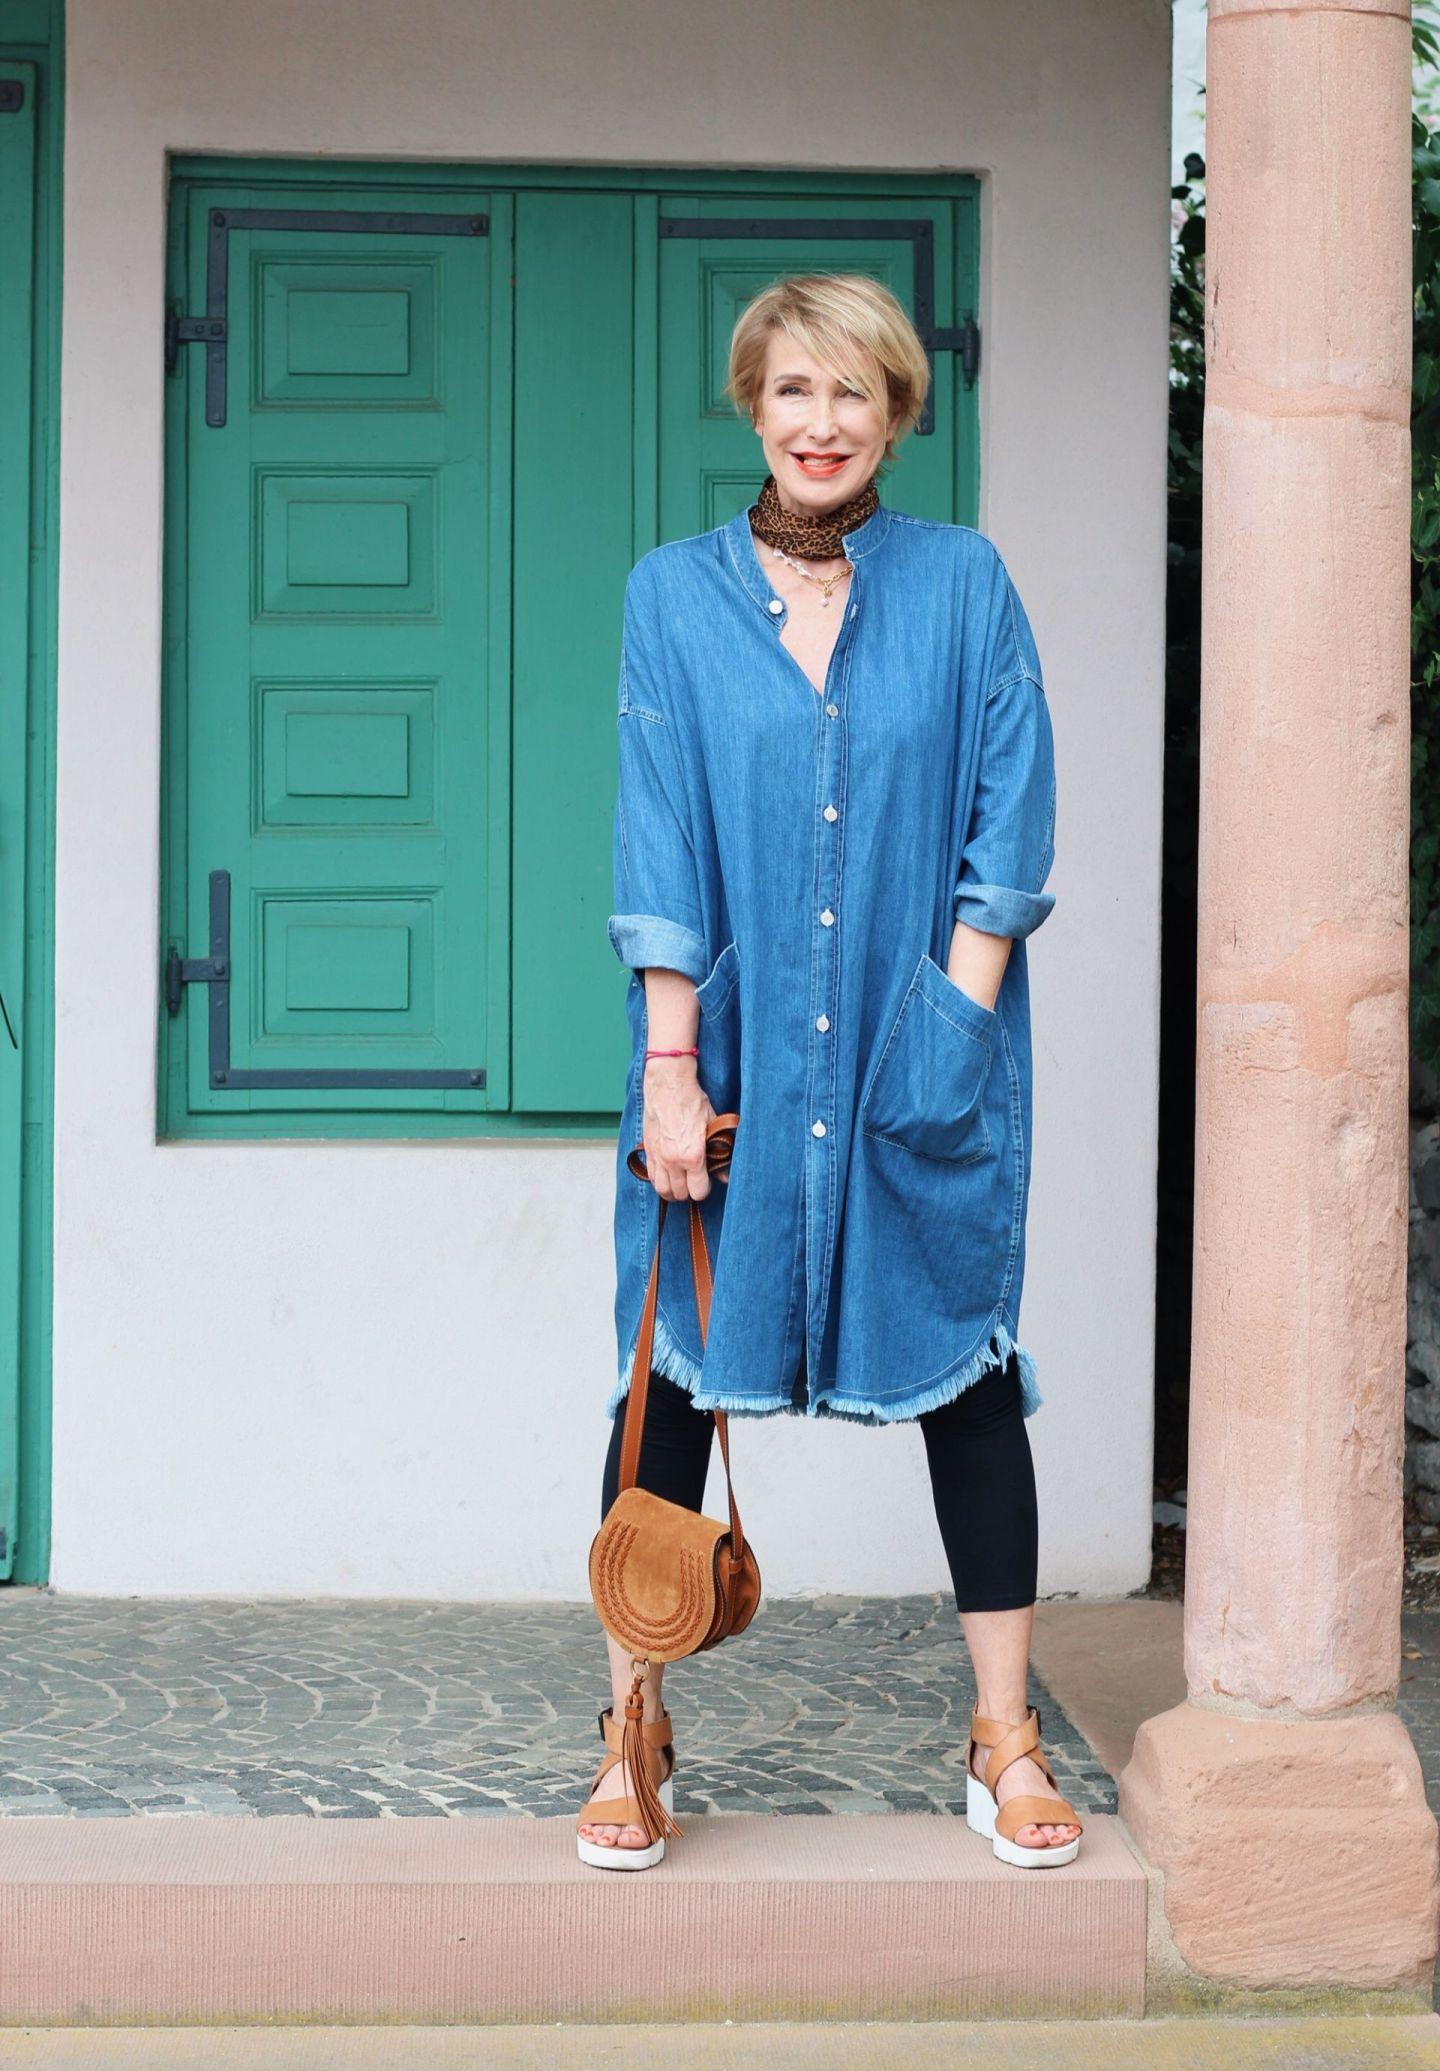 glamupyourlifestyle Jeanskleid hemdblusenkleid ue-40-blog ue-50-blog Fashion-blog